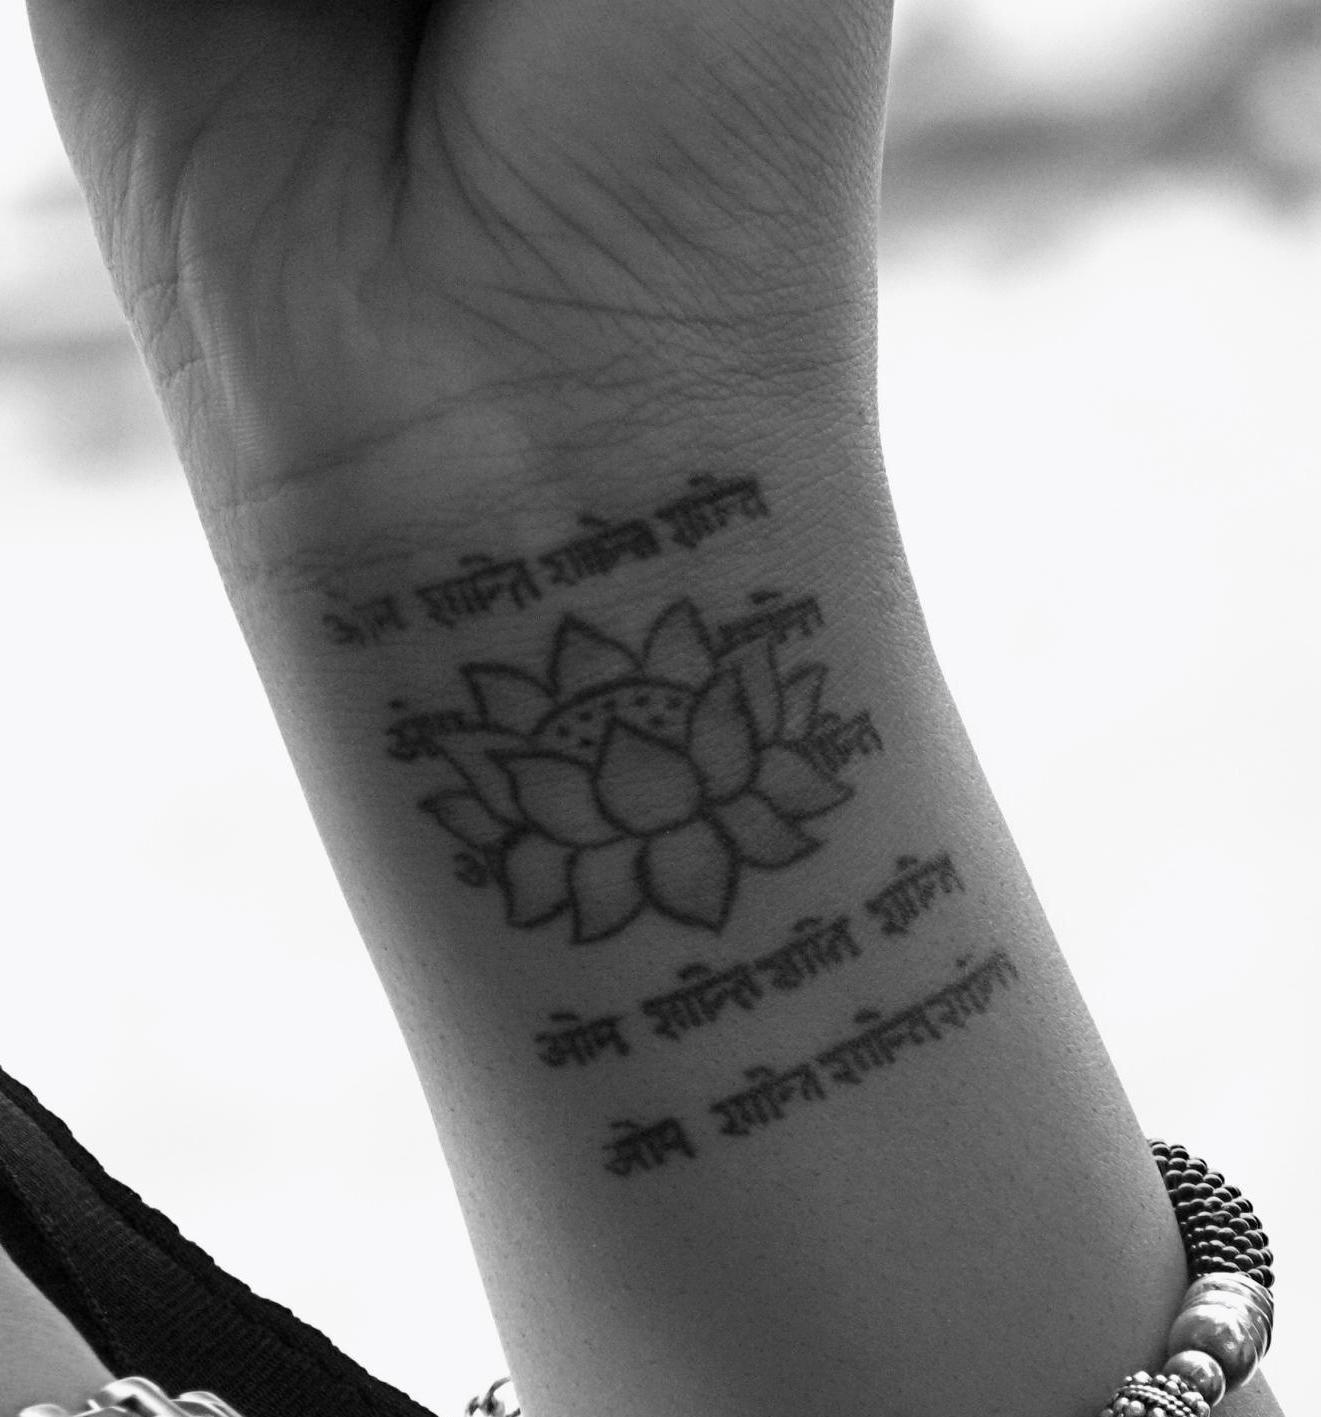 Lotus wrist tattoos tattoo ideas pinterest wrist tattoo lotus wrist tattoos lotus flower tattoo meaningsmall izmirmasajfo